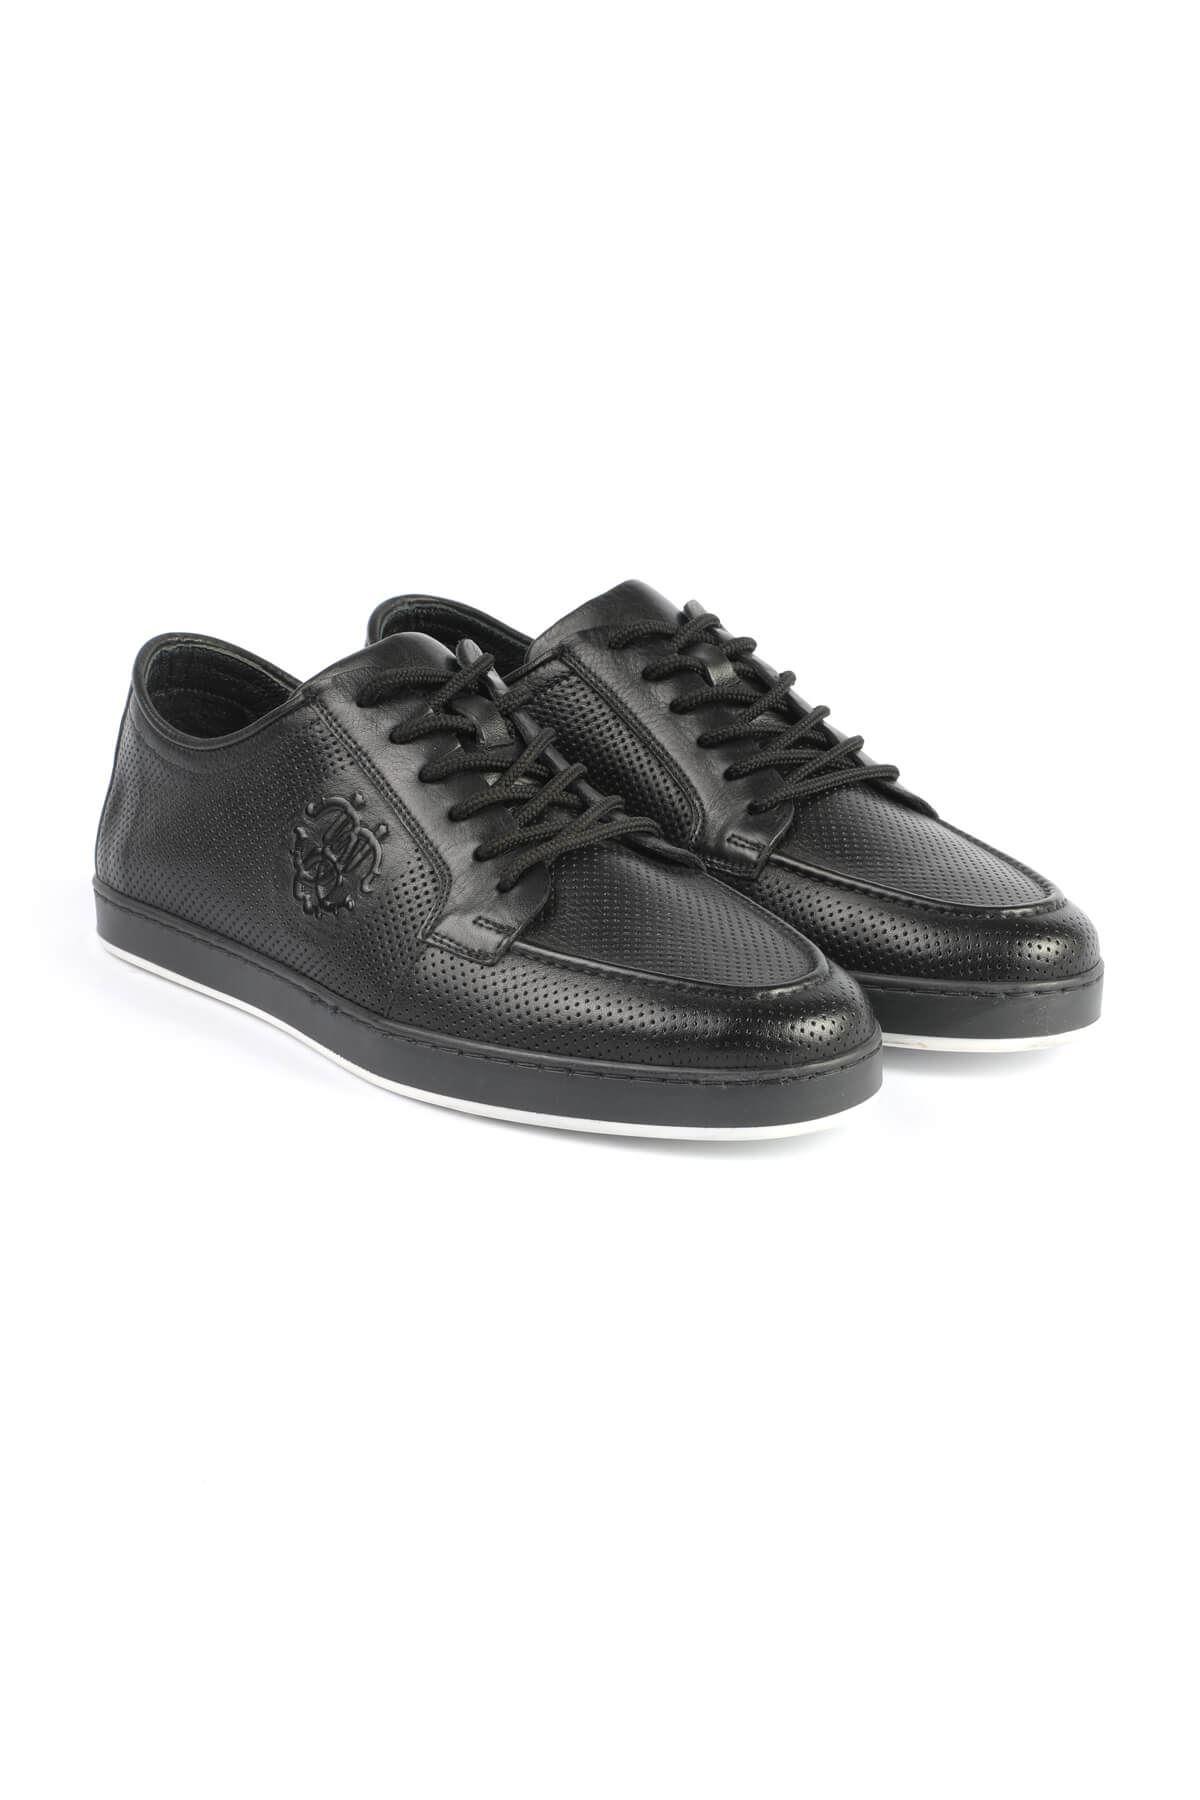 Libero 3200 Black Sneaker Shoes